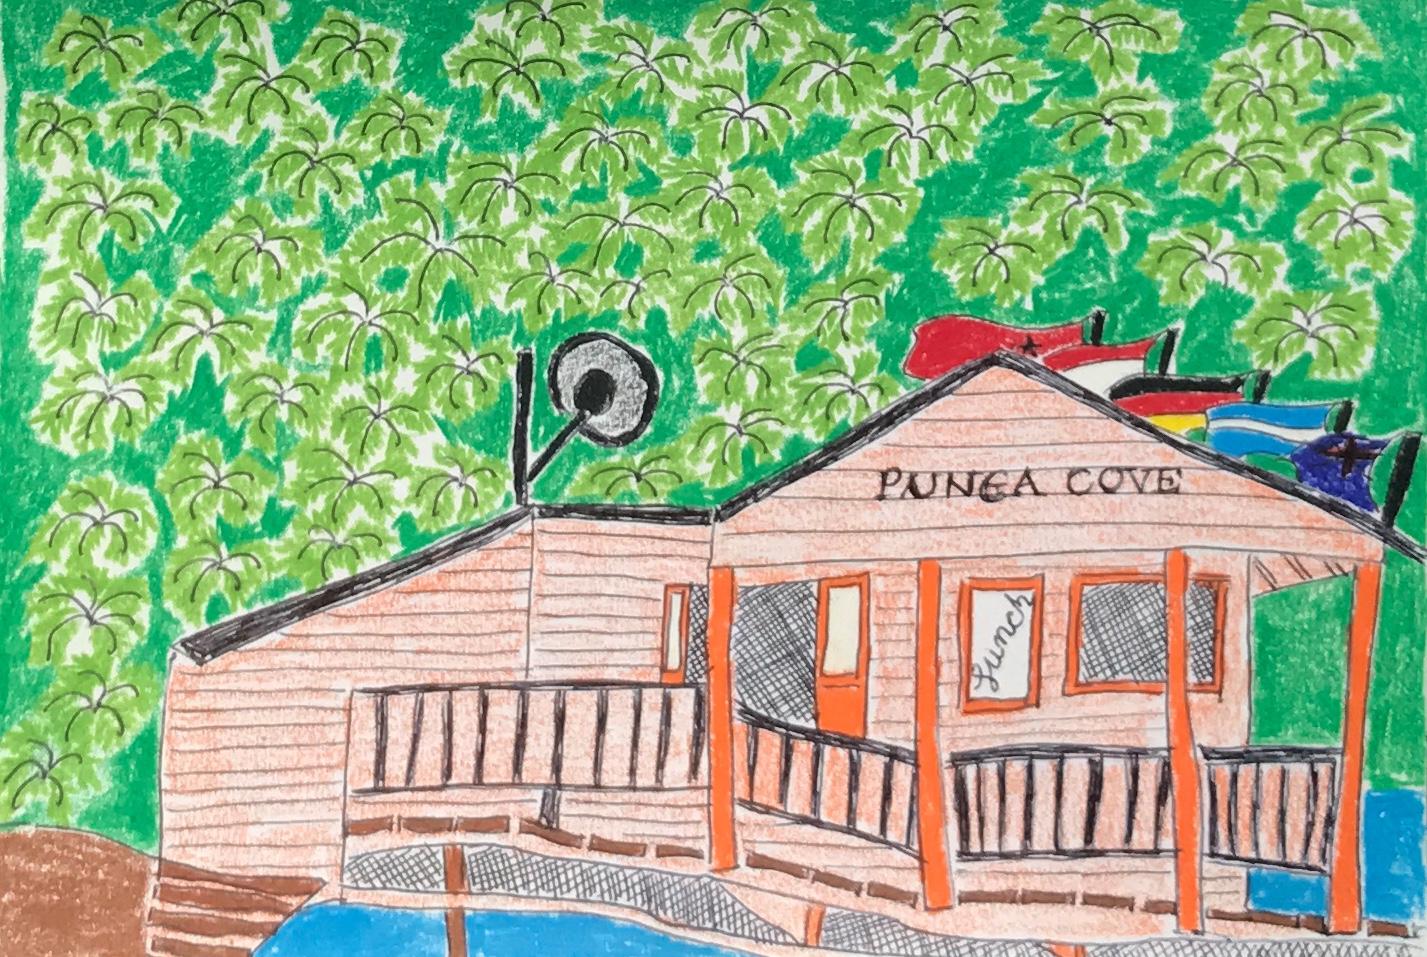 Punga cove cafe